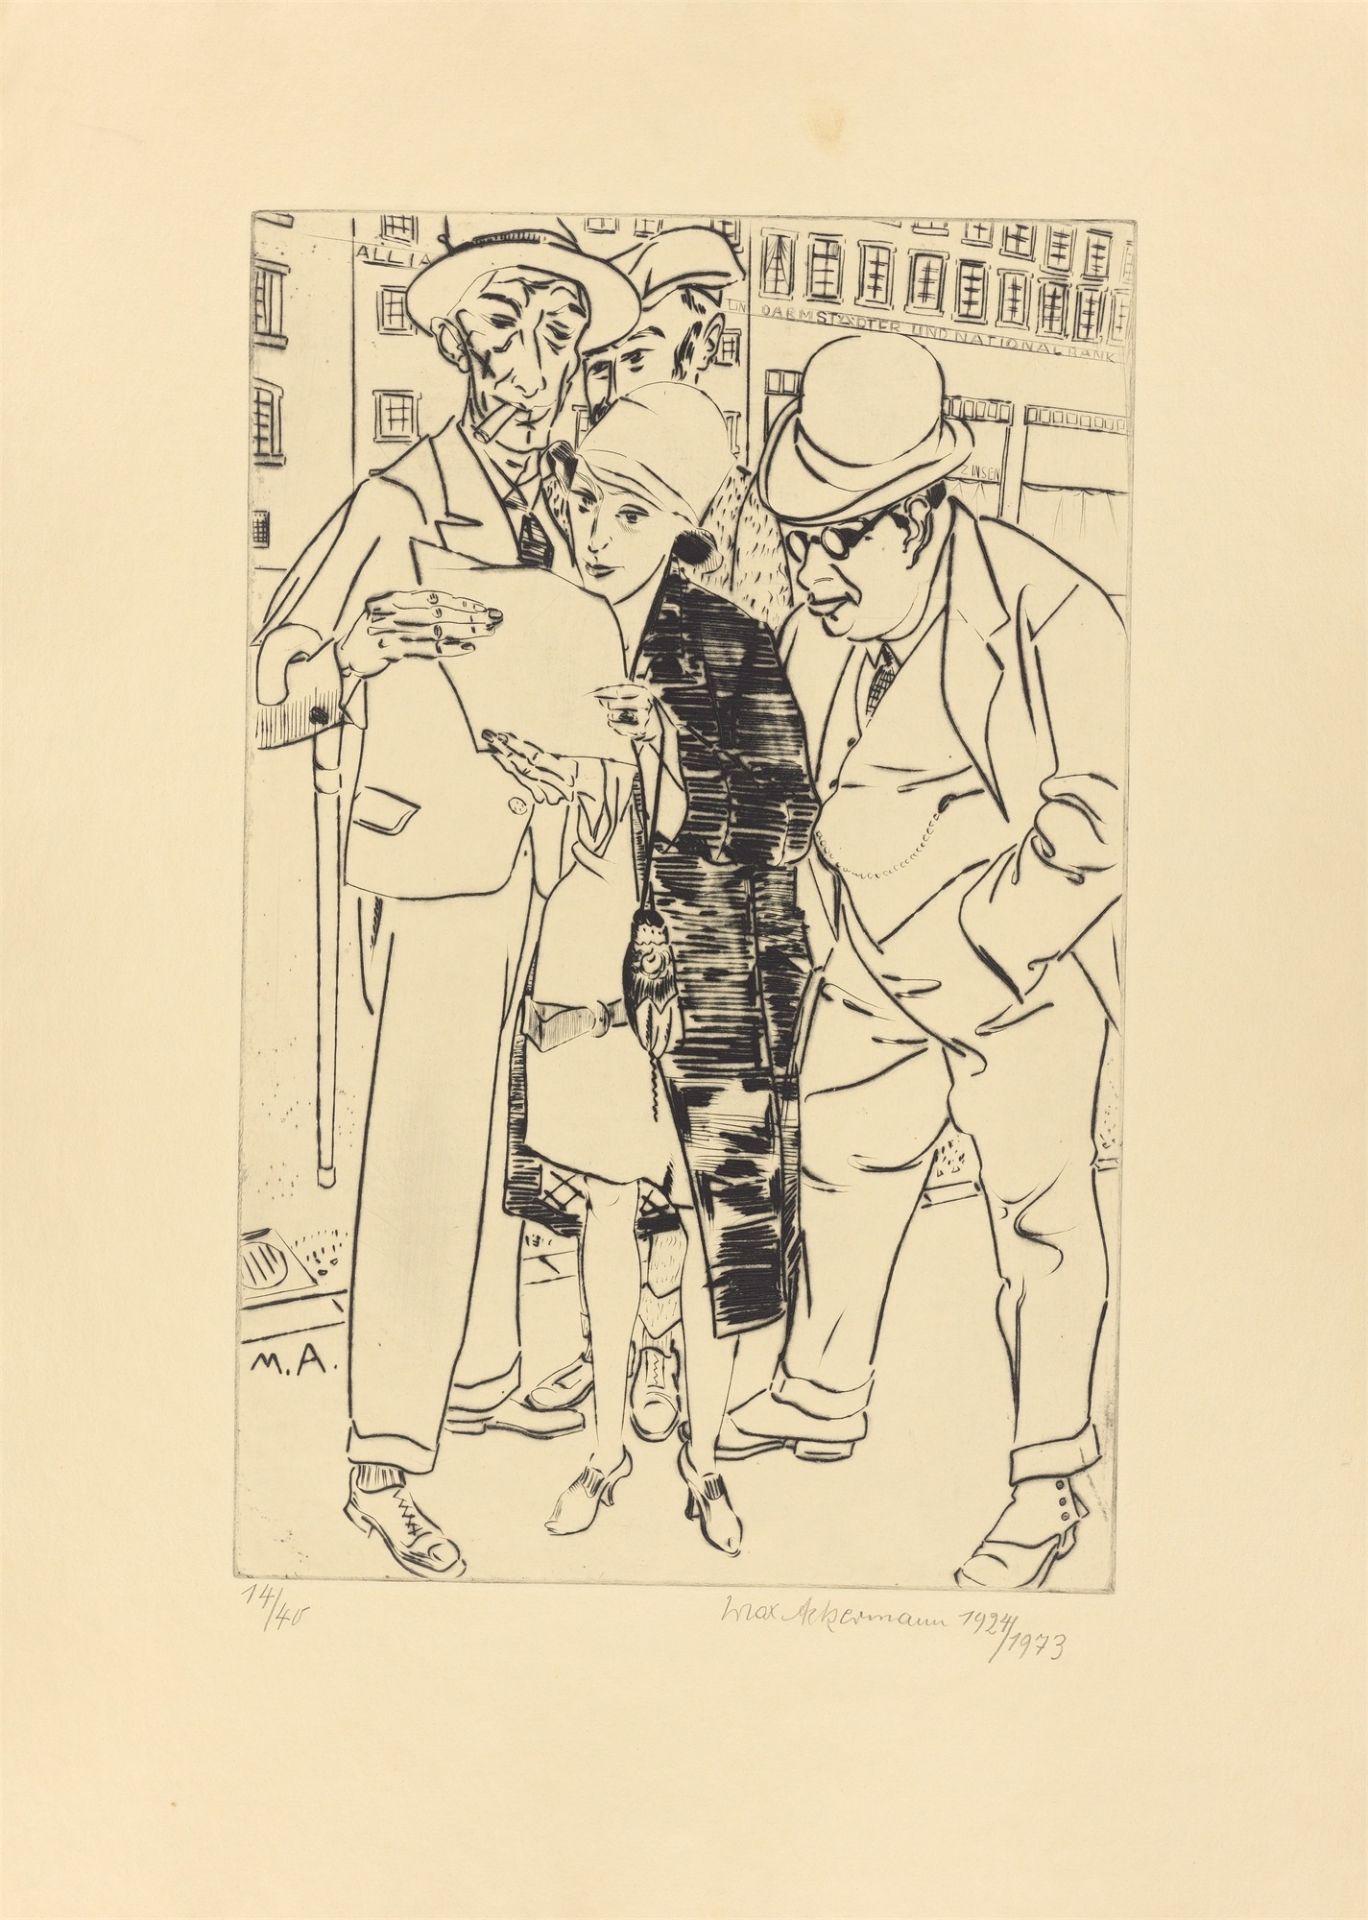 Max Ackermann. Special edition. 1924/73